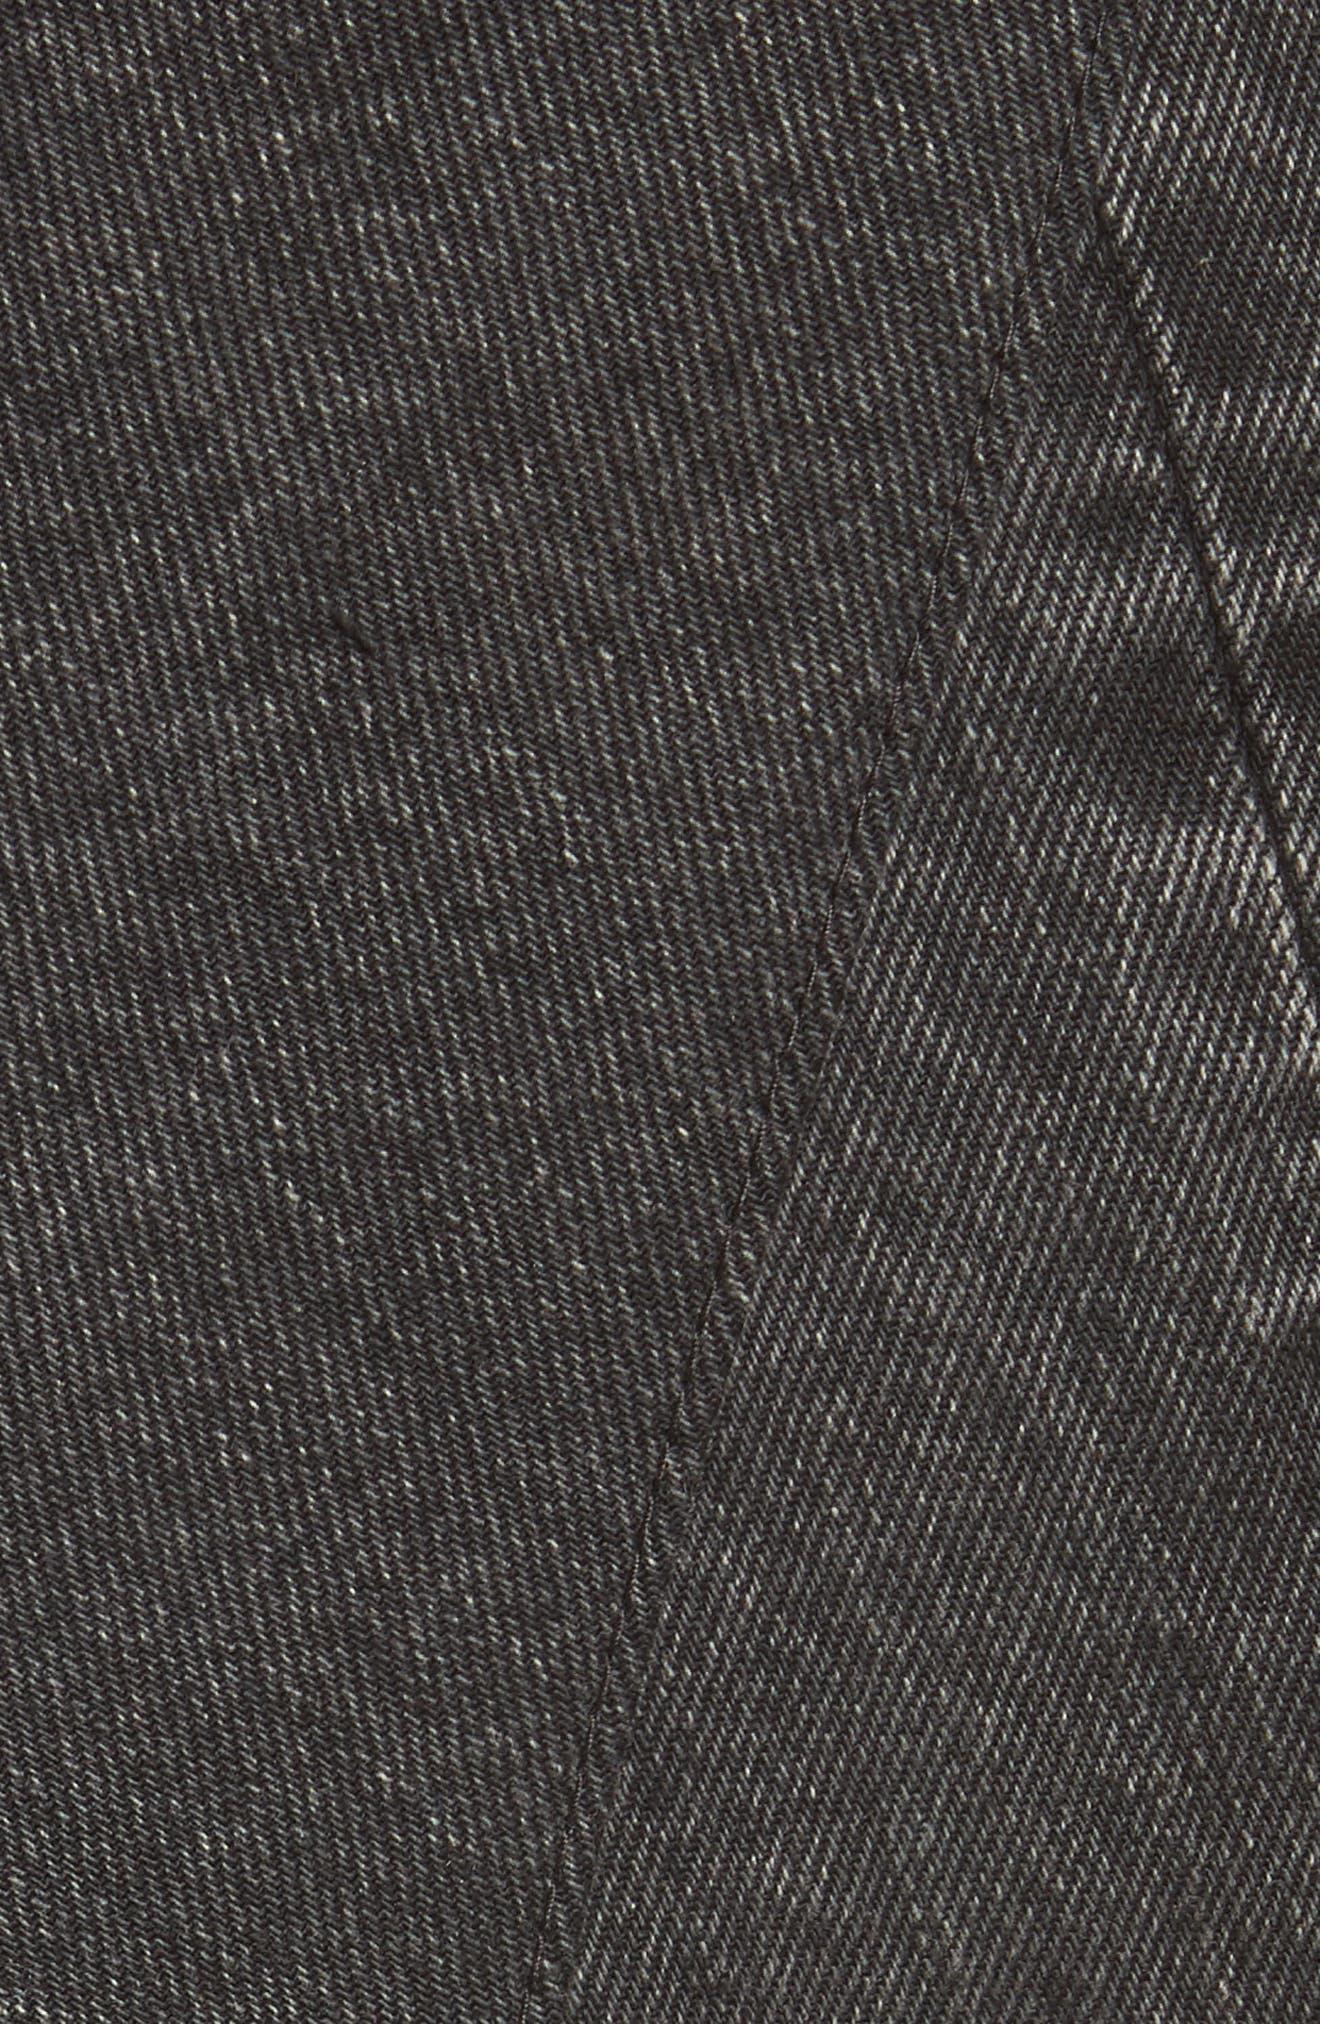 Patchwork Denim Tunic,                             Alternate thumbnail 5, color,                             001